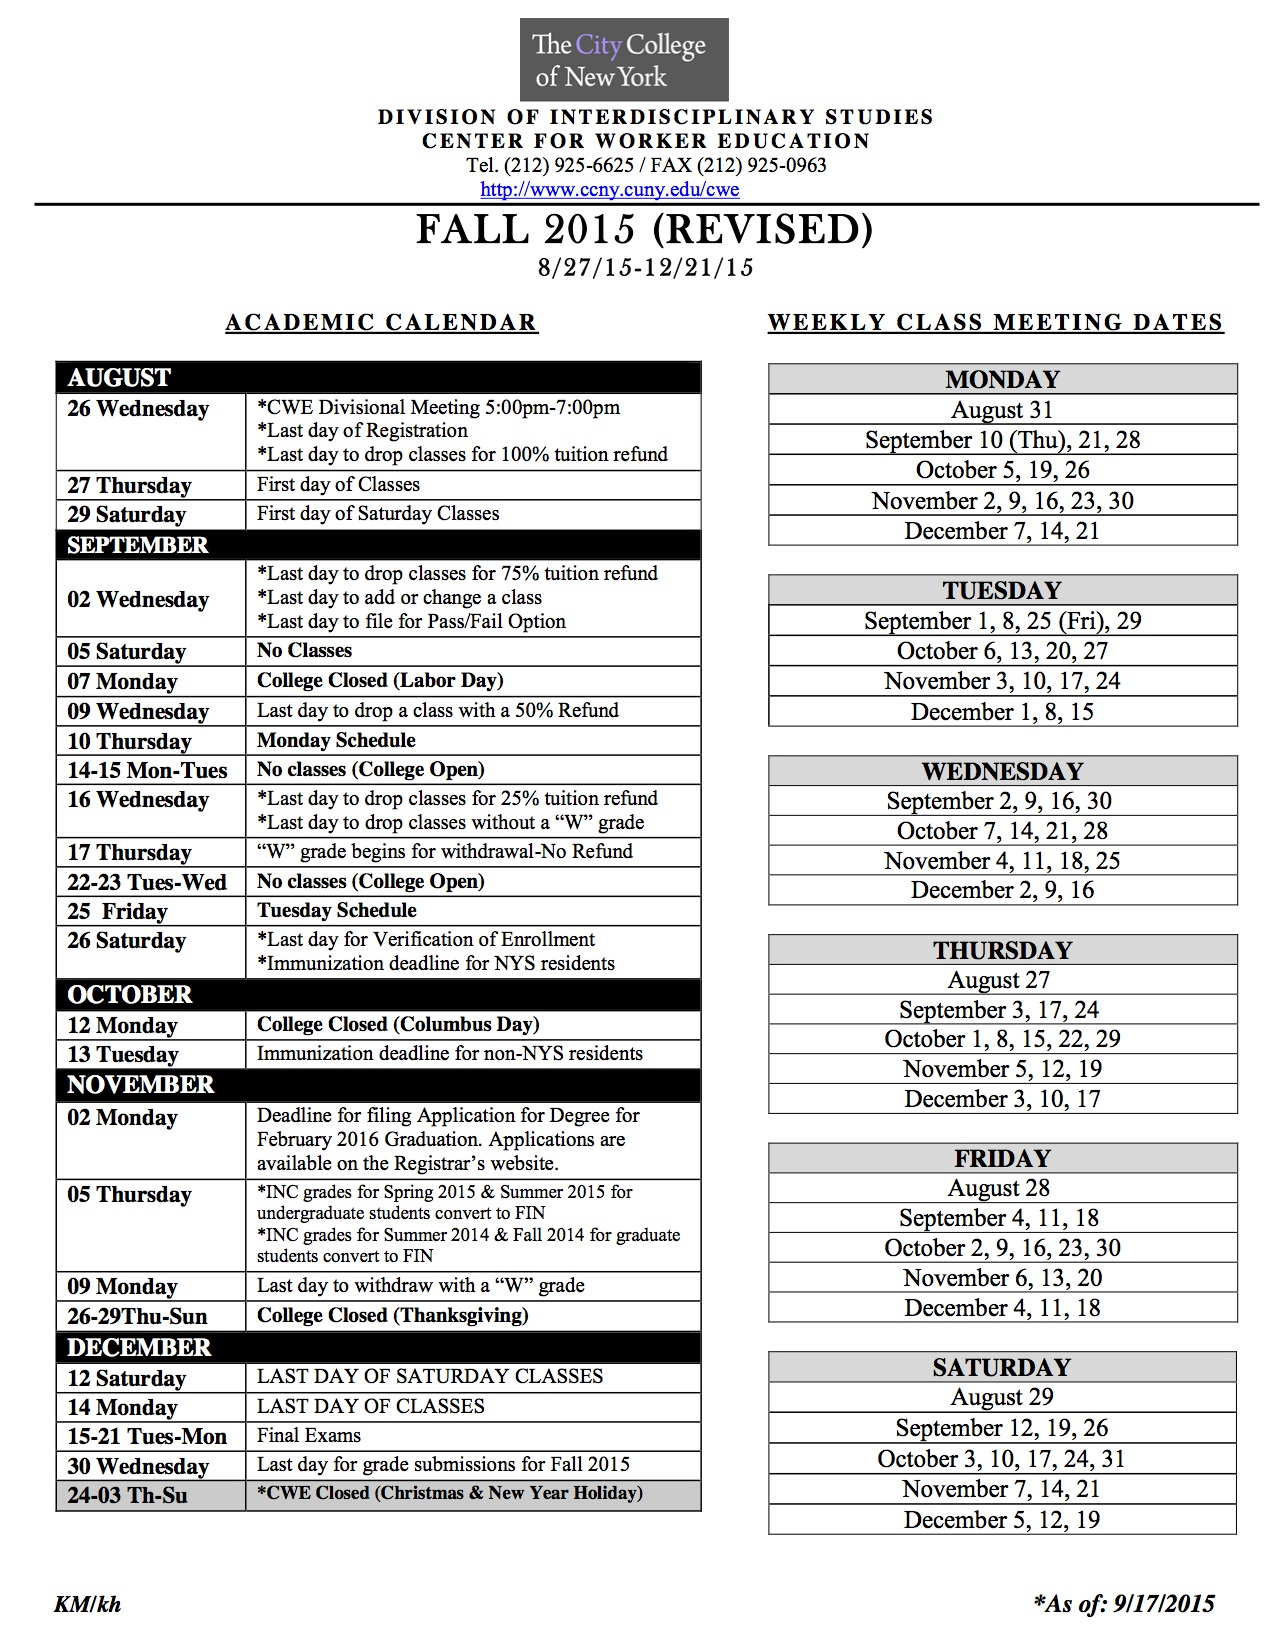 Academic Calendar | The City College Of New York Within Naugatuck Valley Community College Calendar